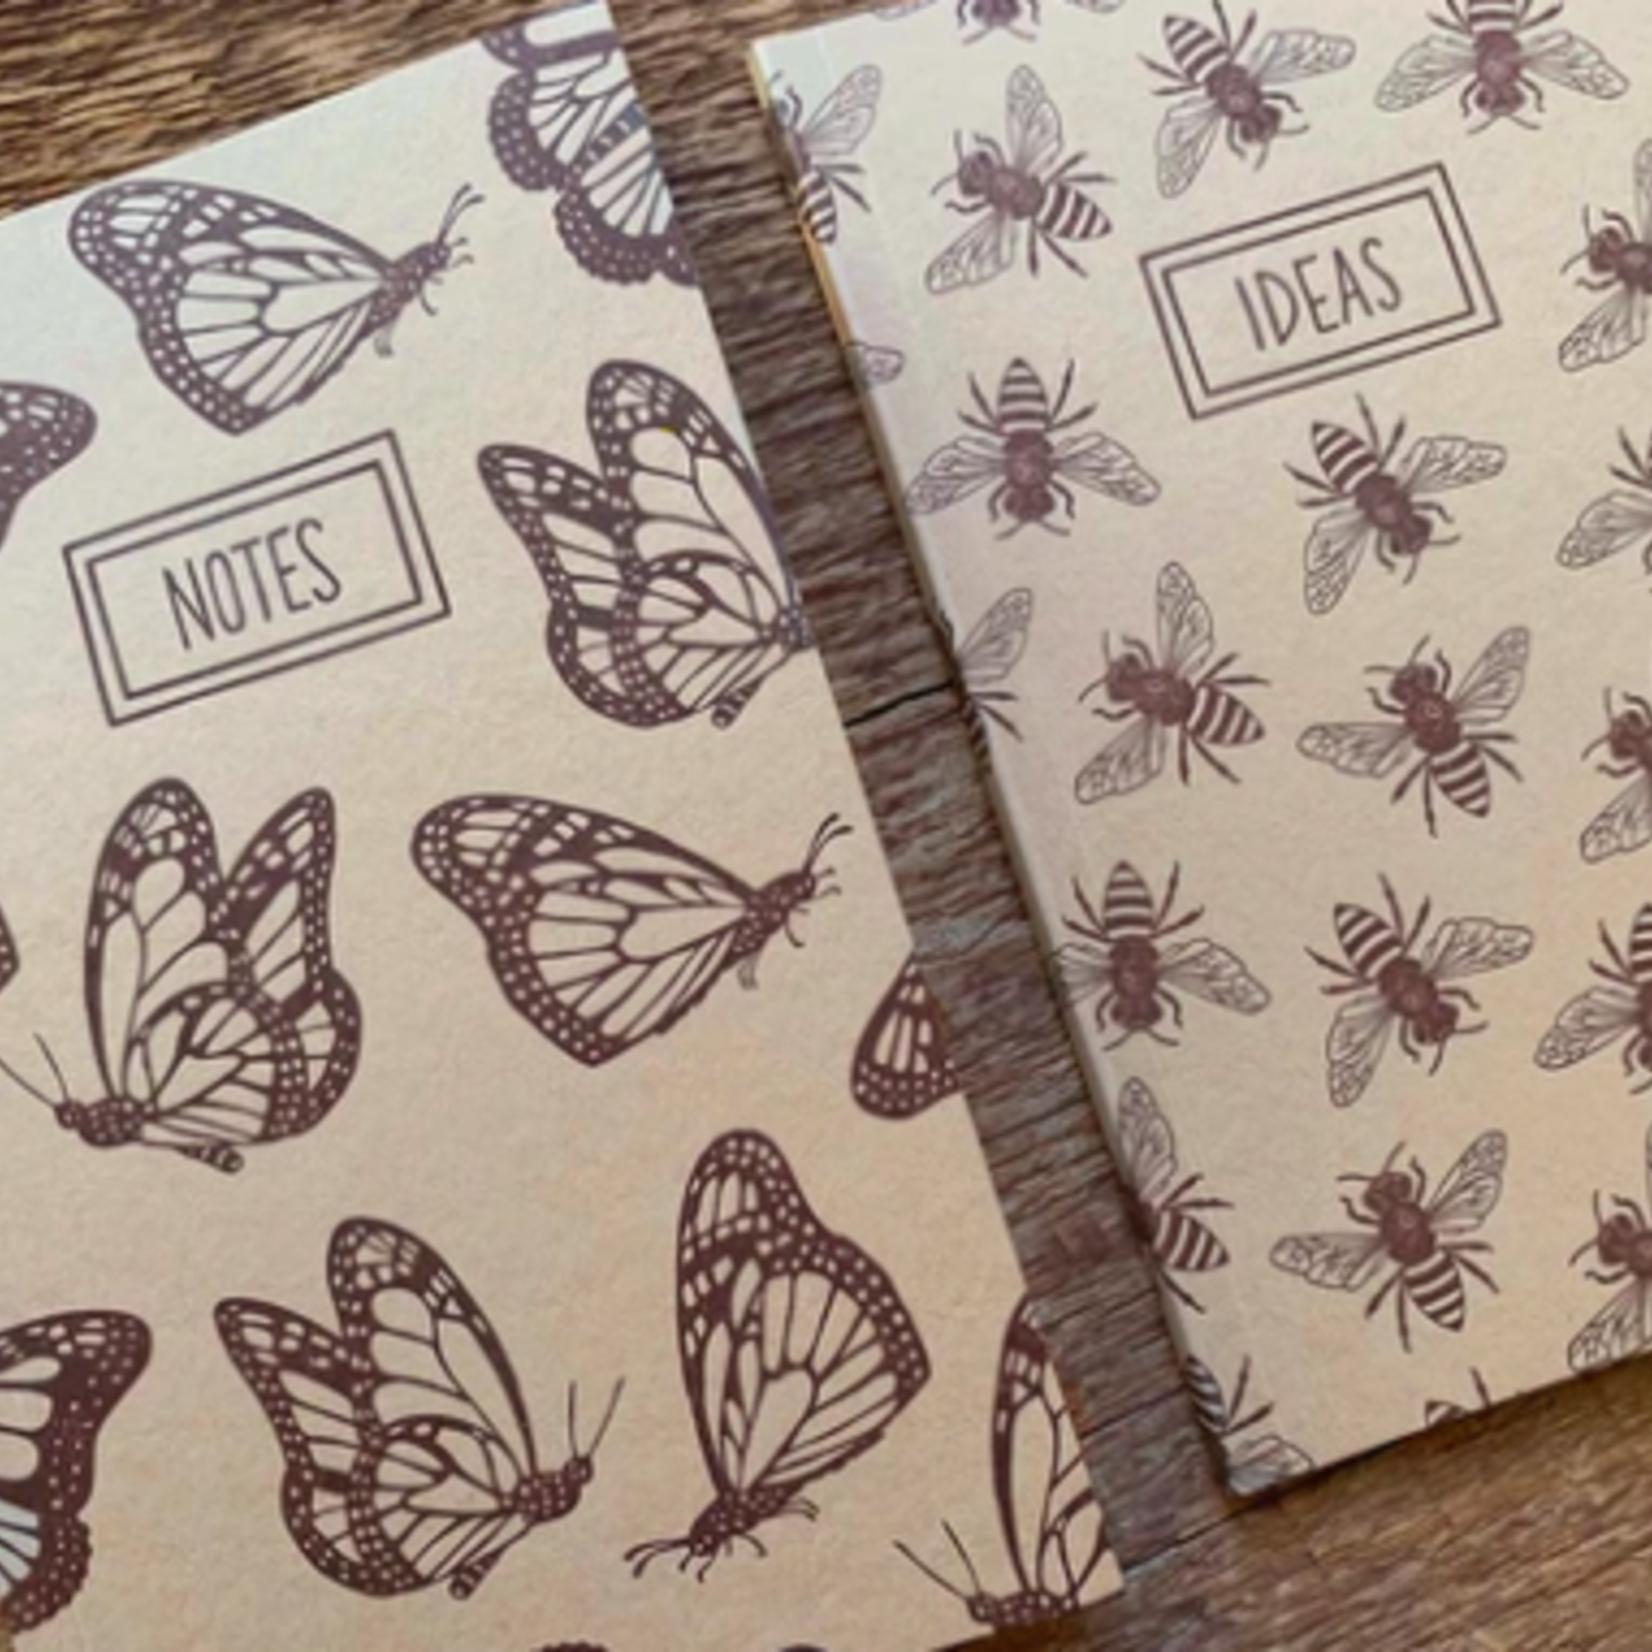 Noteworthy Monarchs & Bees Notebook Set